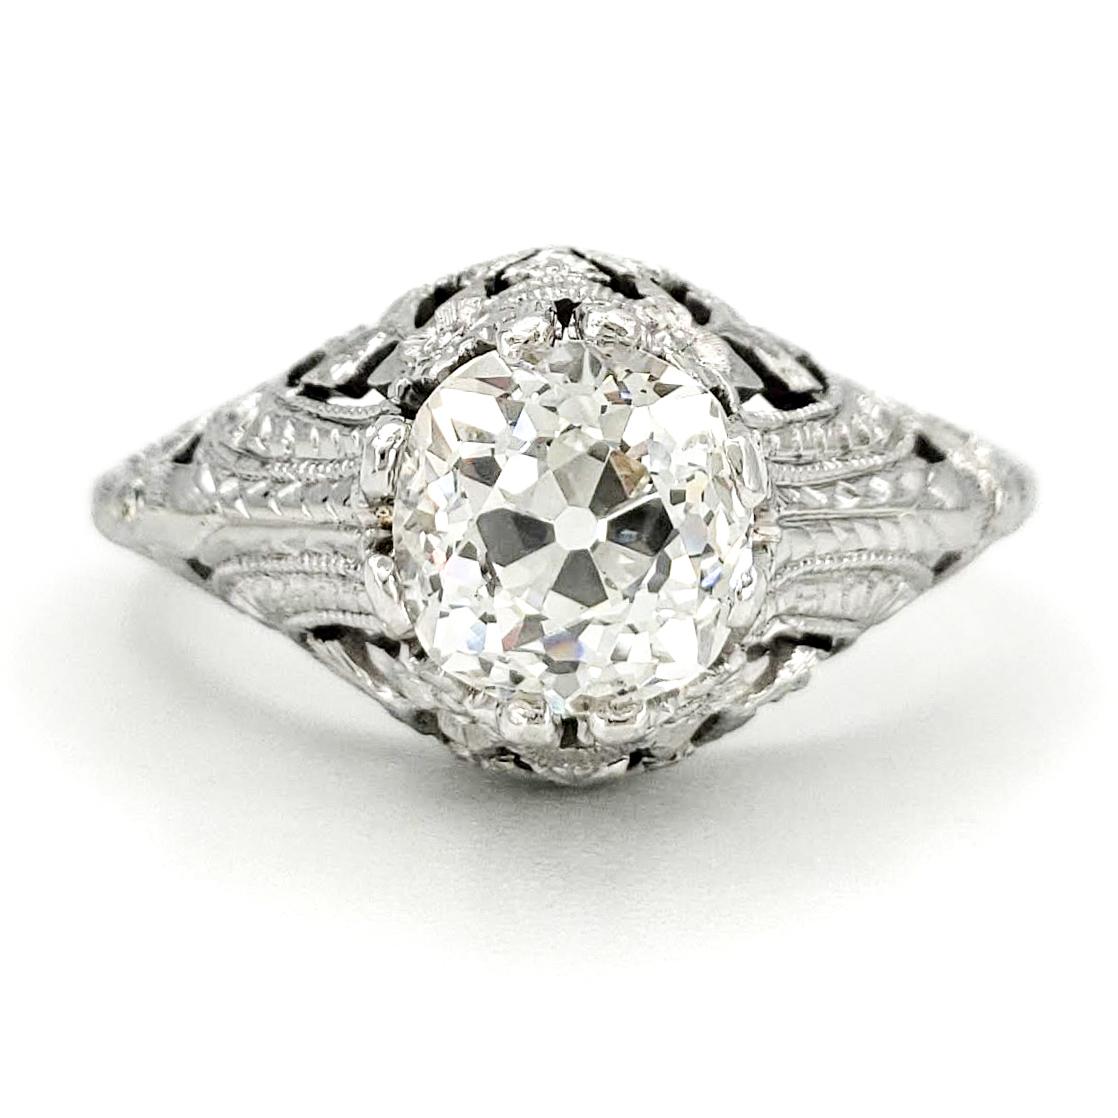 vintage-platinum-engagement-ring-with-1-27-carat-old-european-cut-diamond-egl-h-vs2